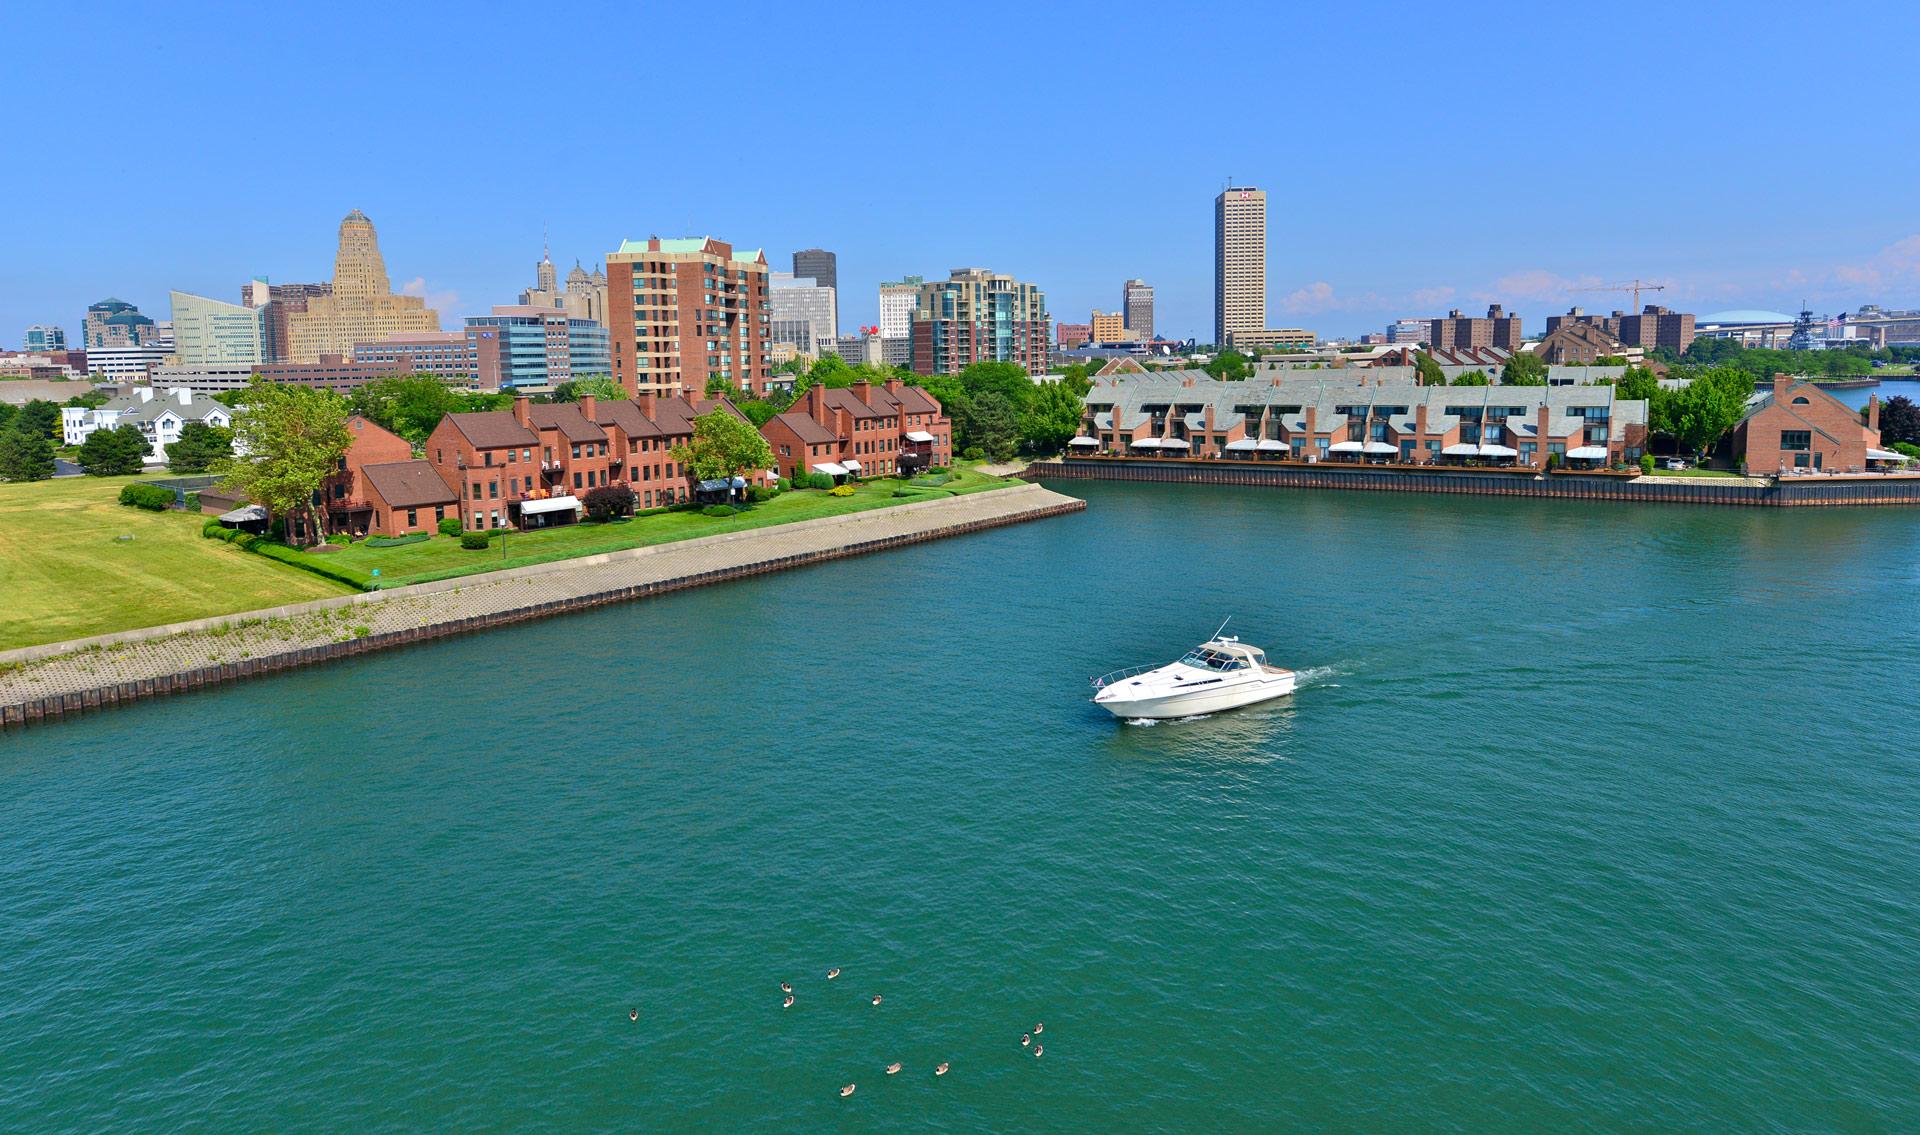 Moving to Upstate New York - Buffalo waterfront